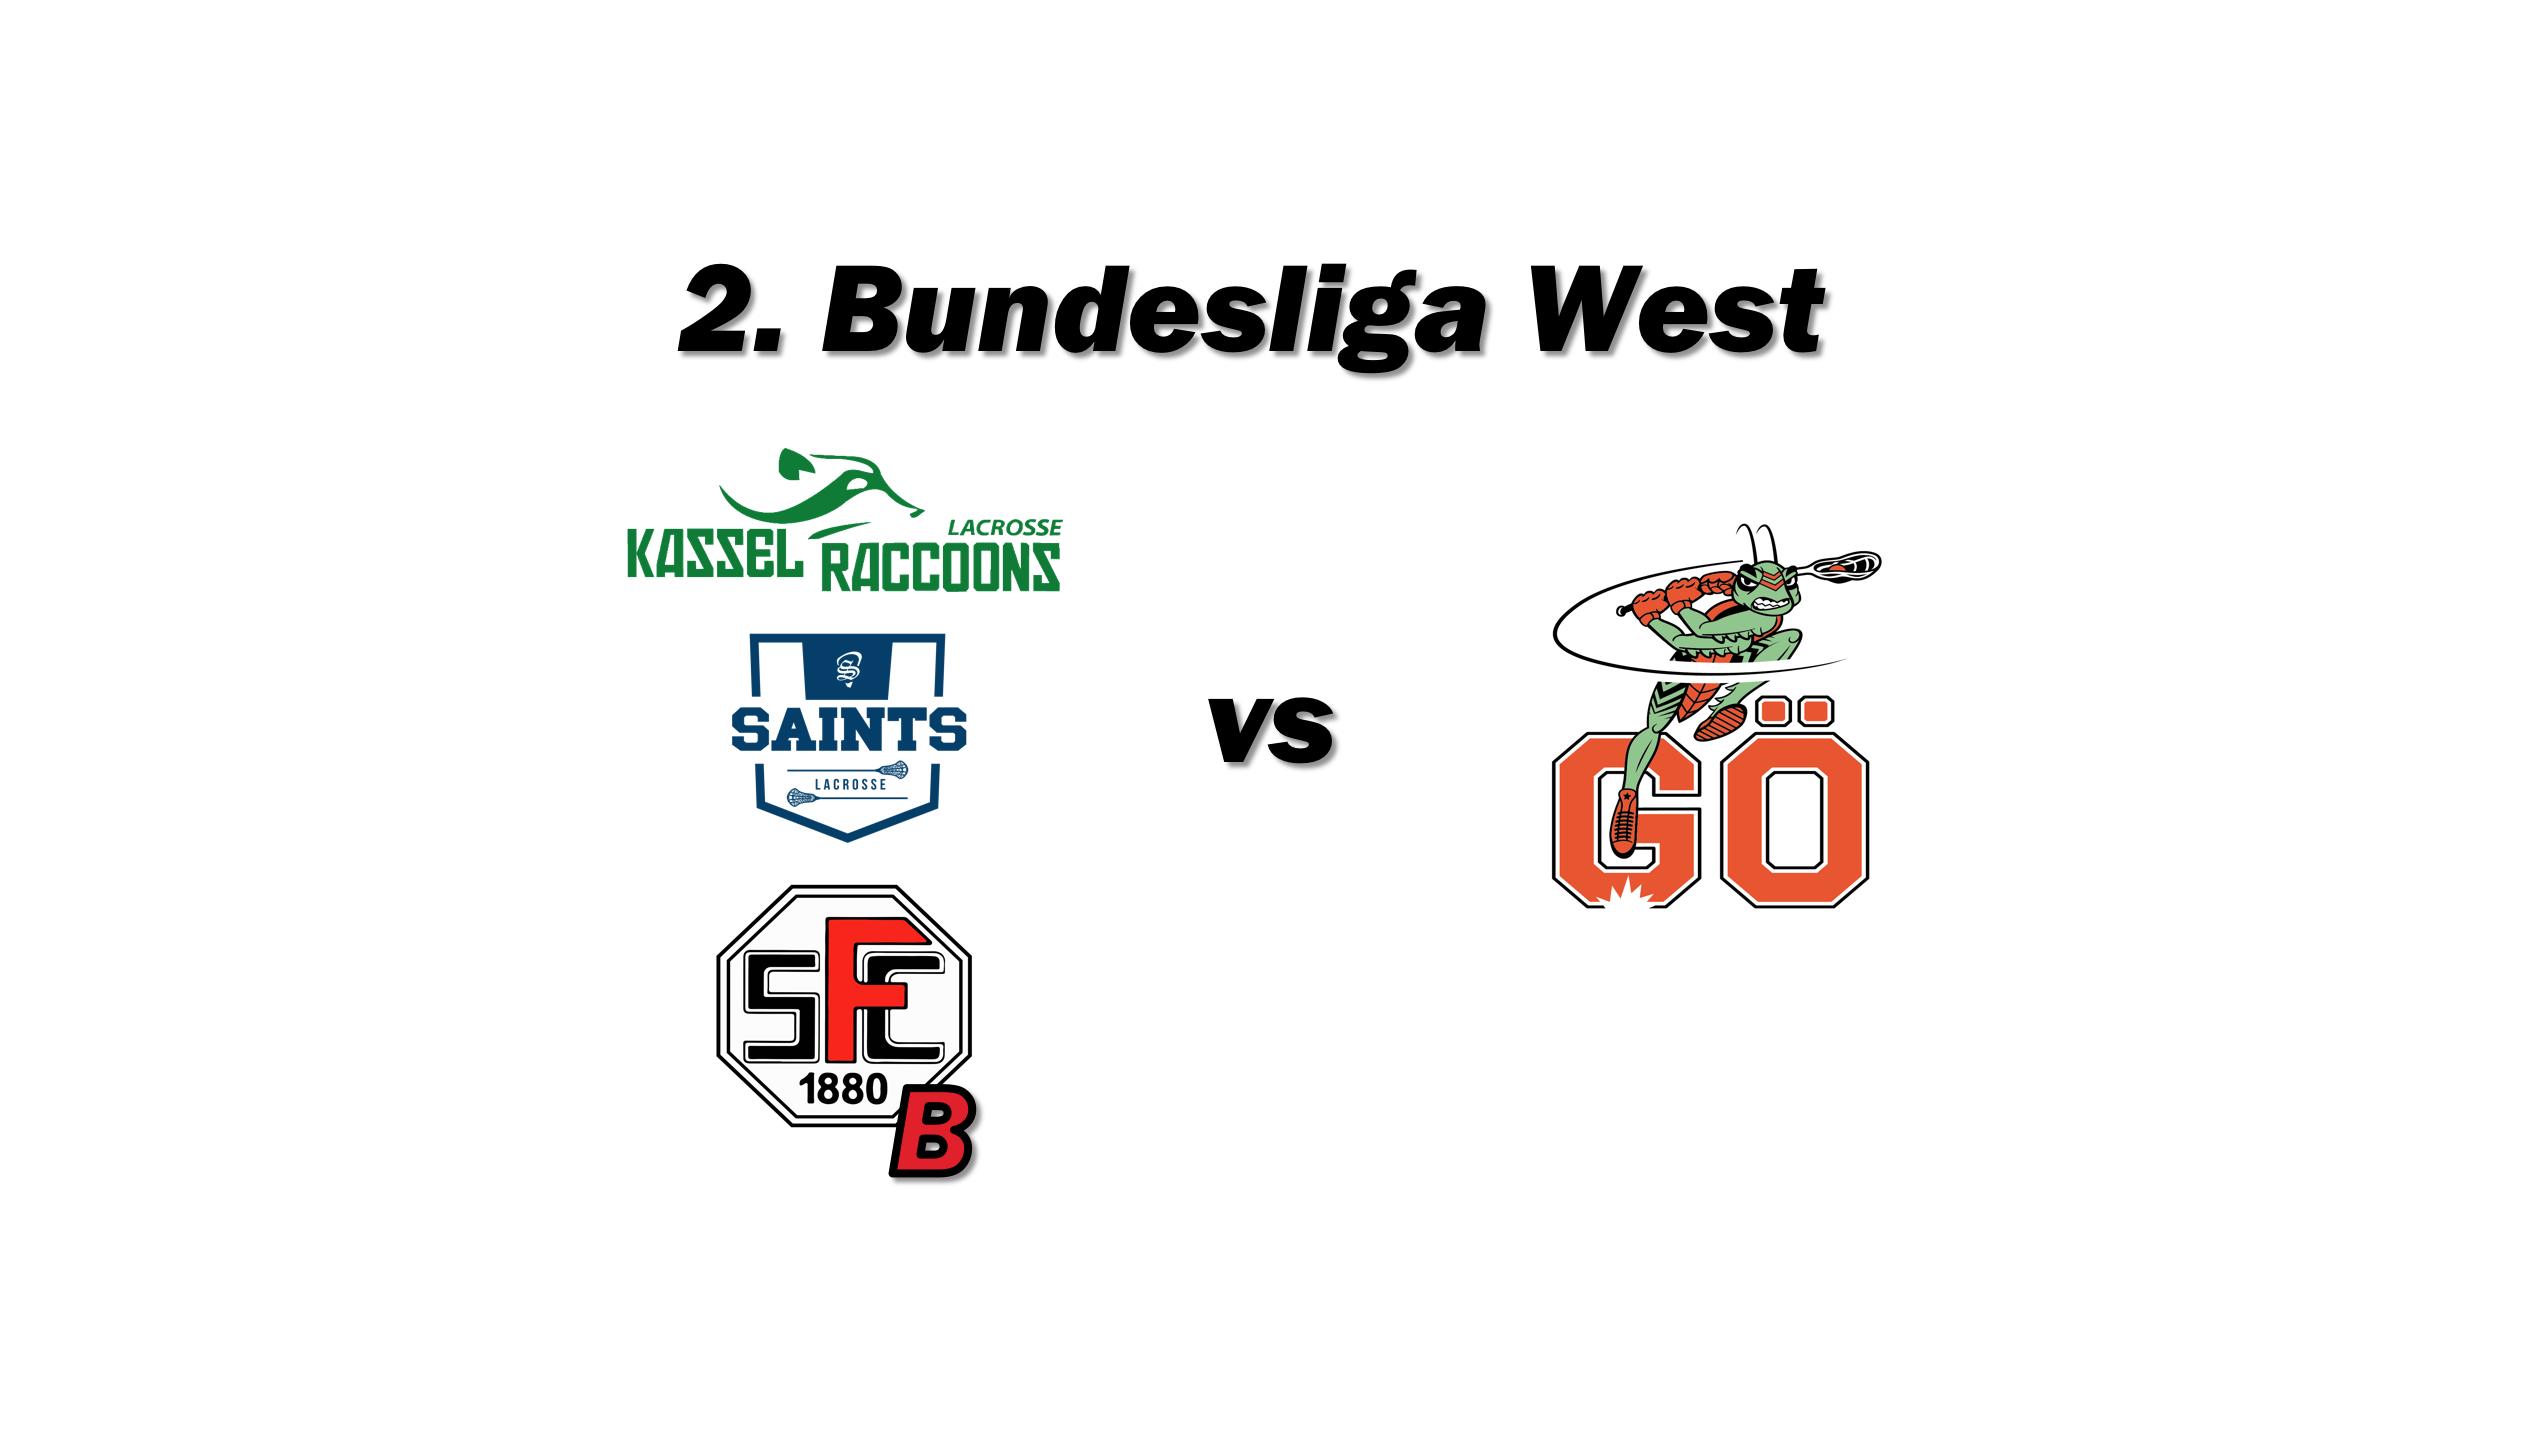 2. Bundesliga West der Damen